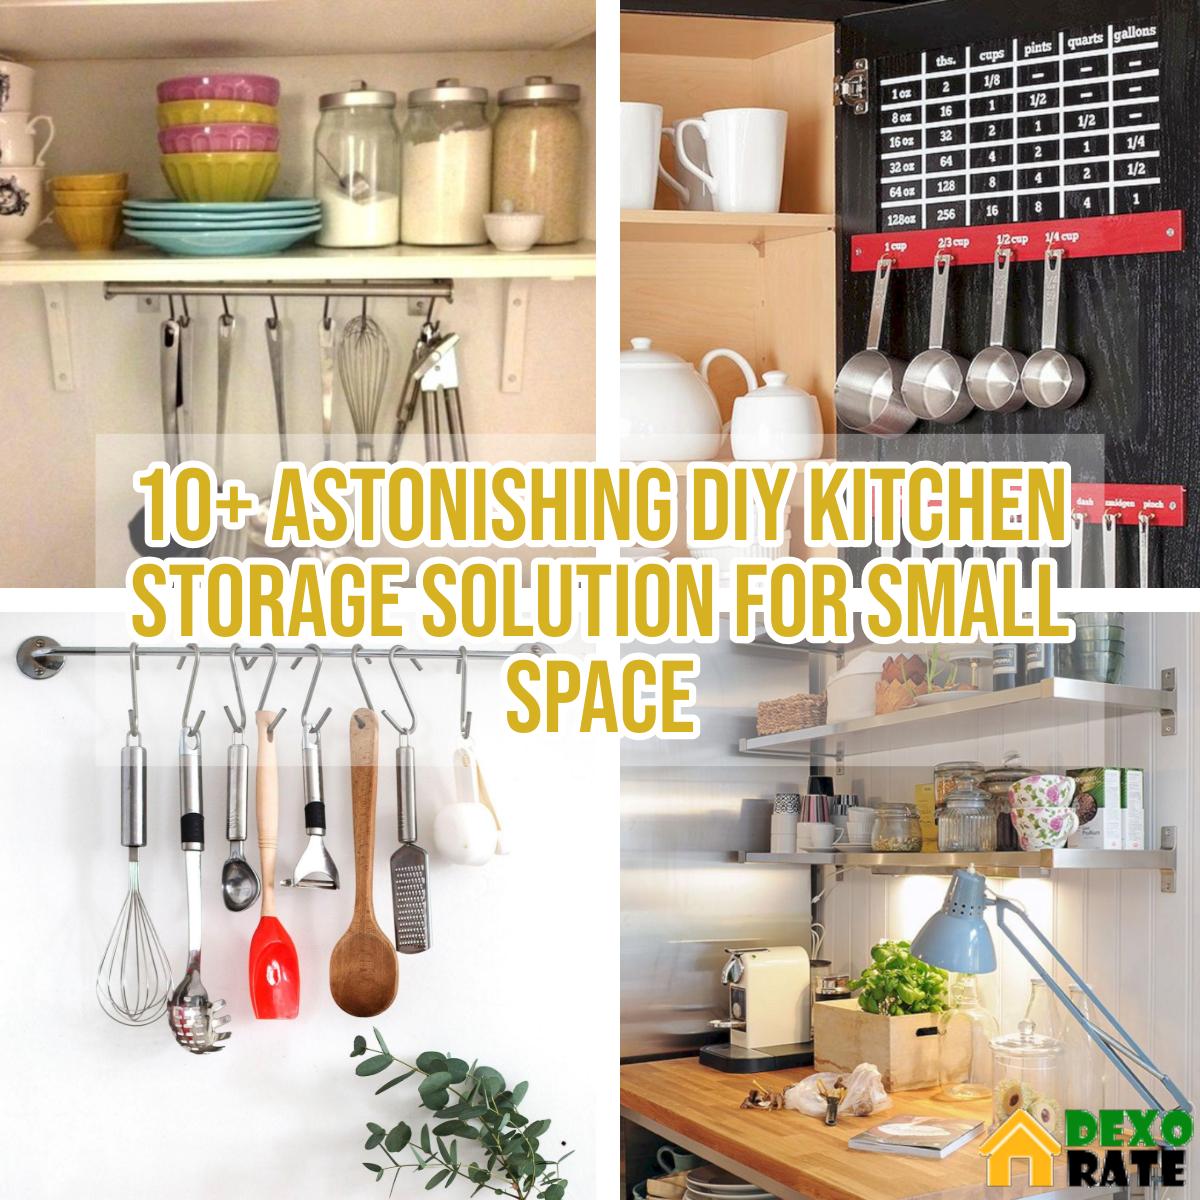 10 astonishing diy kitchen storage solution for small space diy kitchen diy kitchen storage on kitchen organization for small spaces id=43759